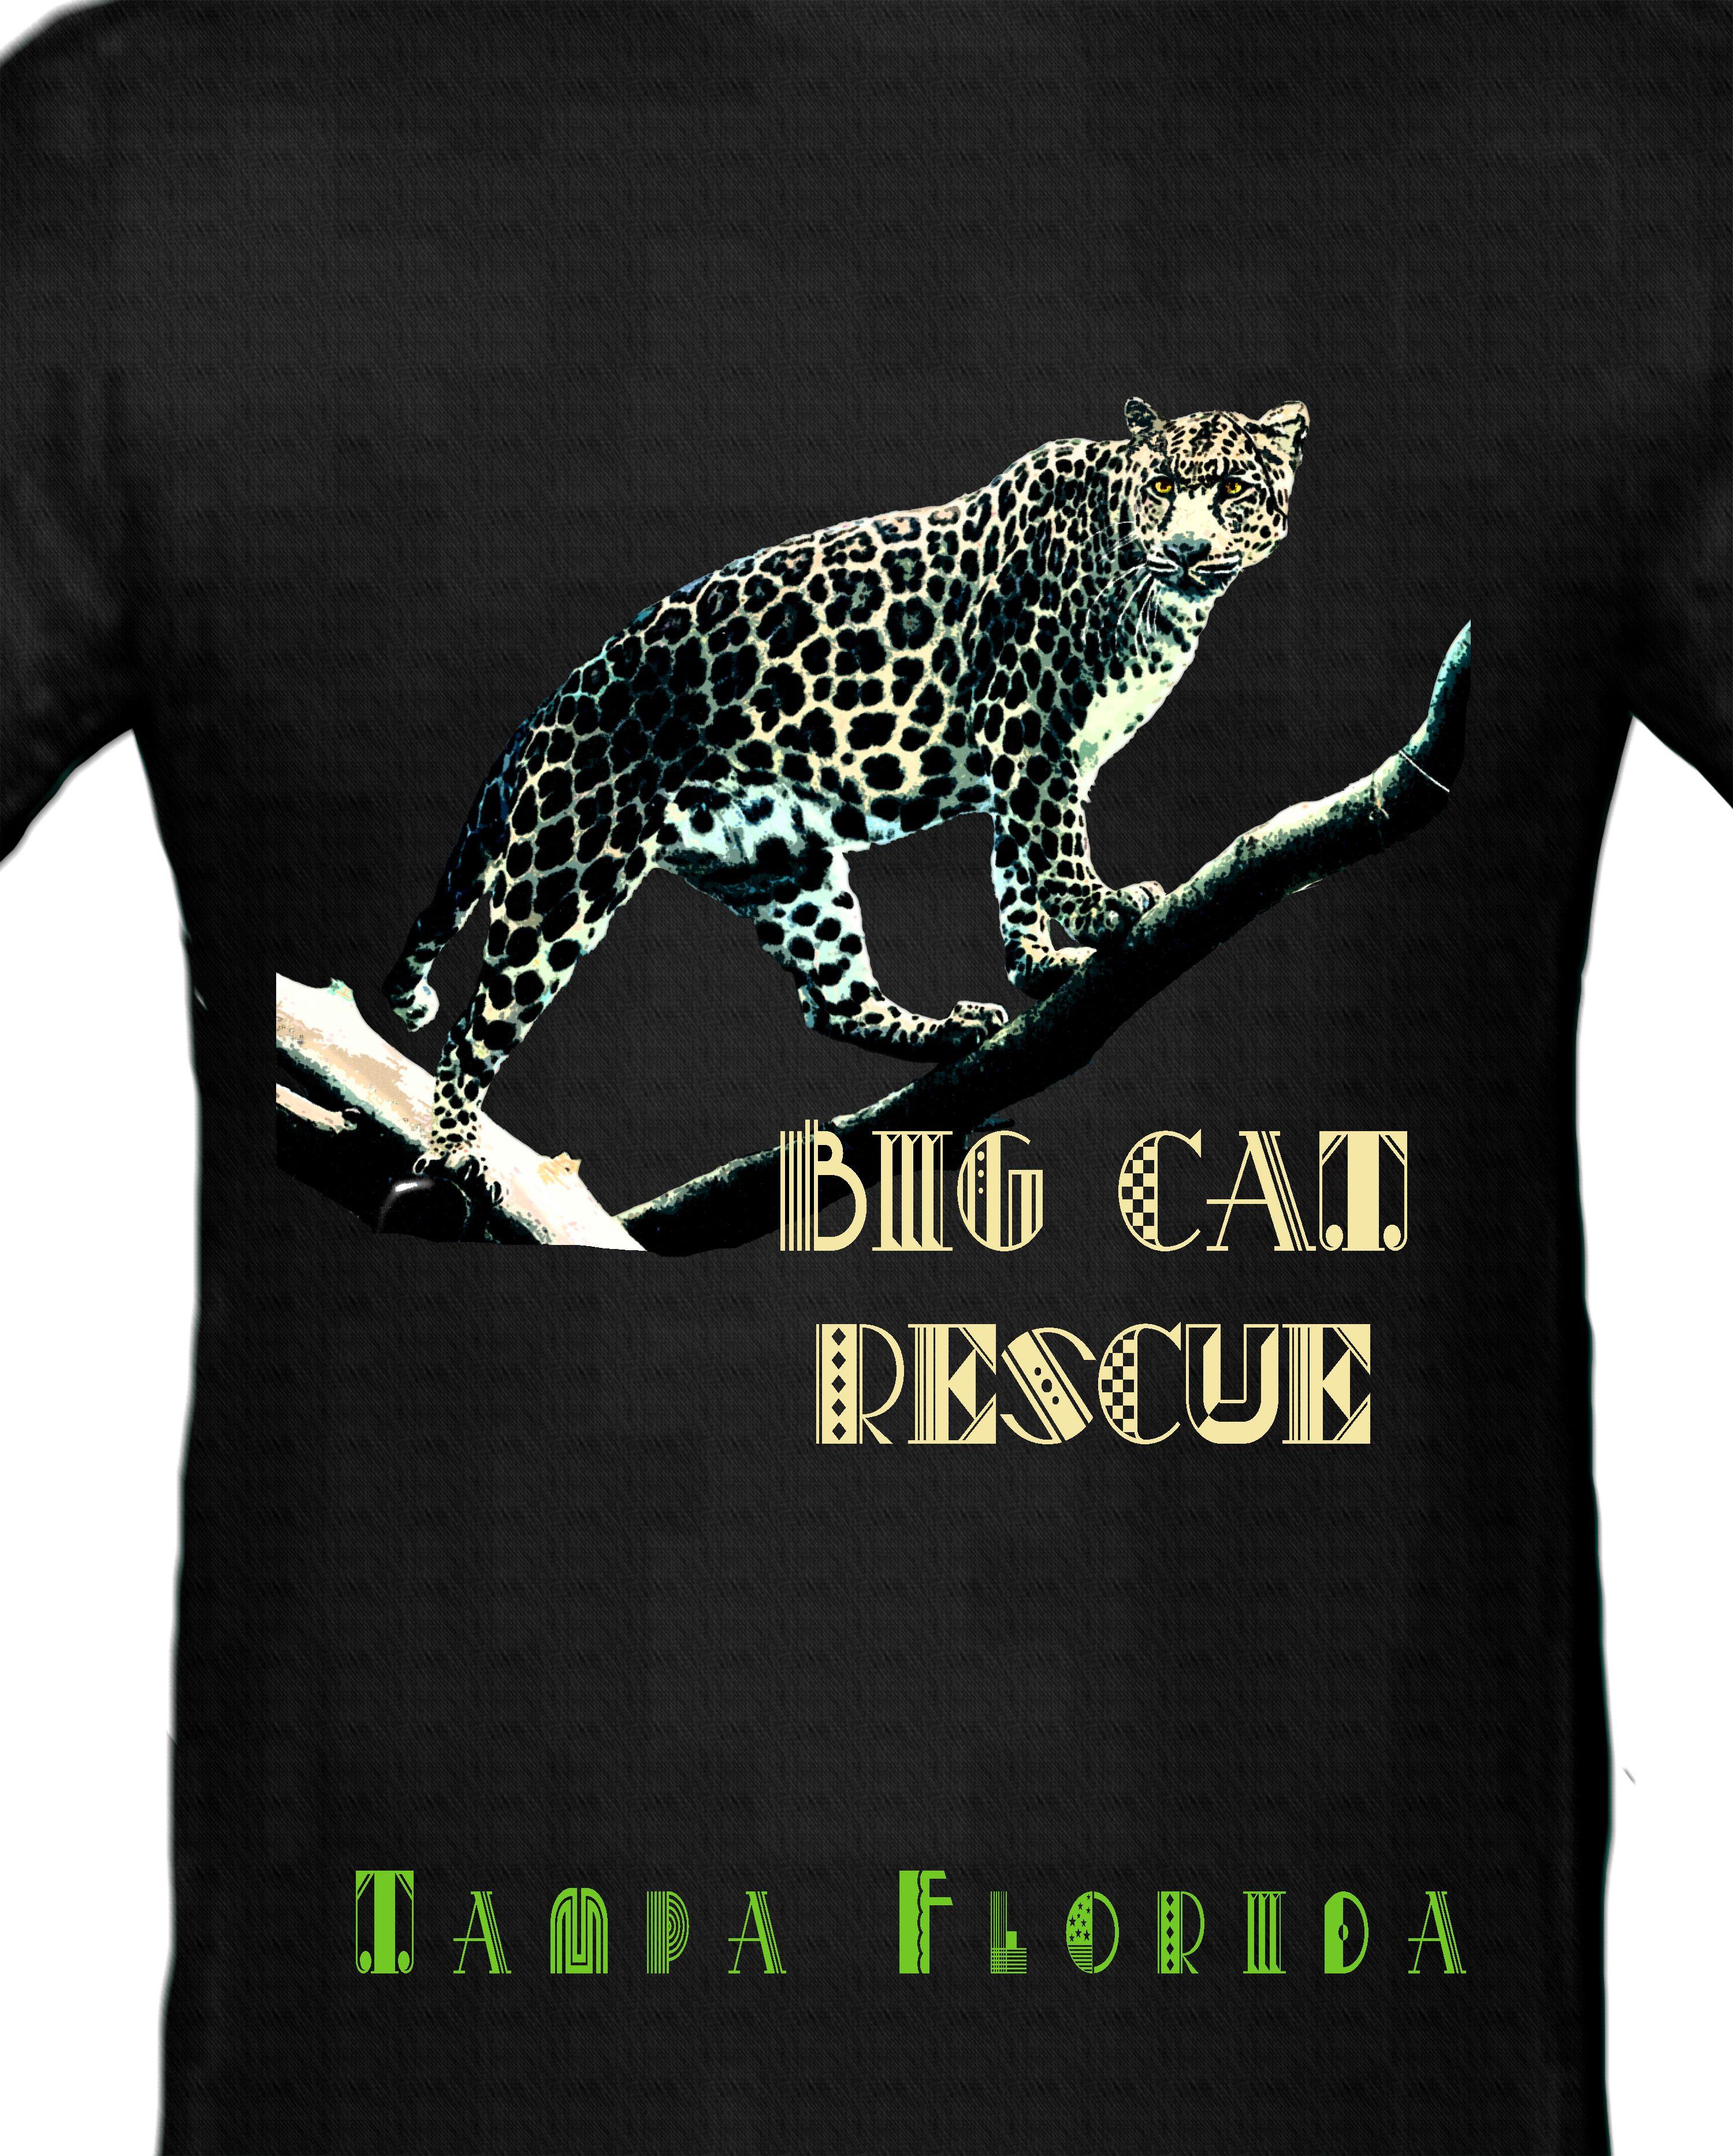 classic shop t retro in the mens variation jaguar jag shirts garage british of taken shirt single